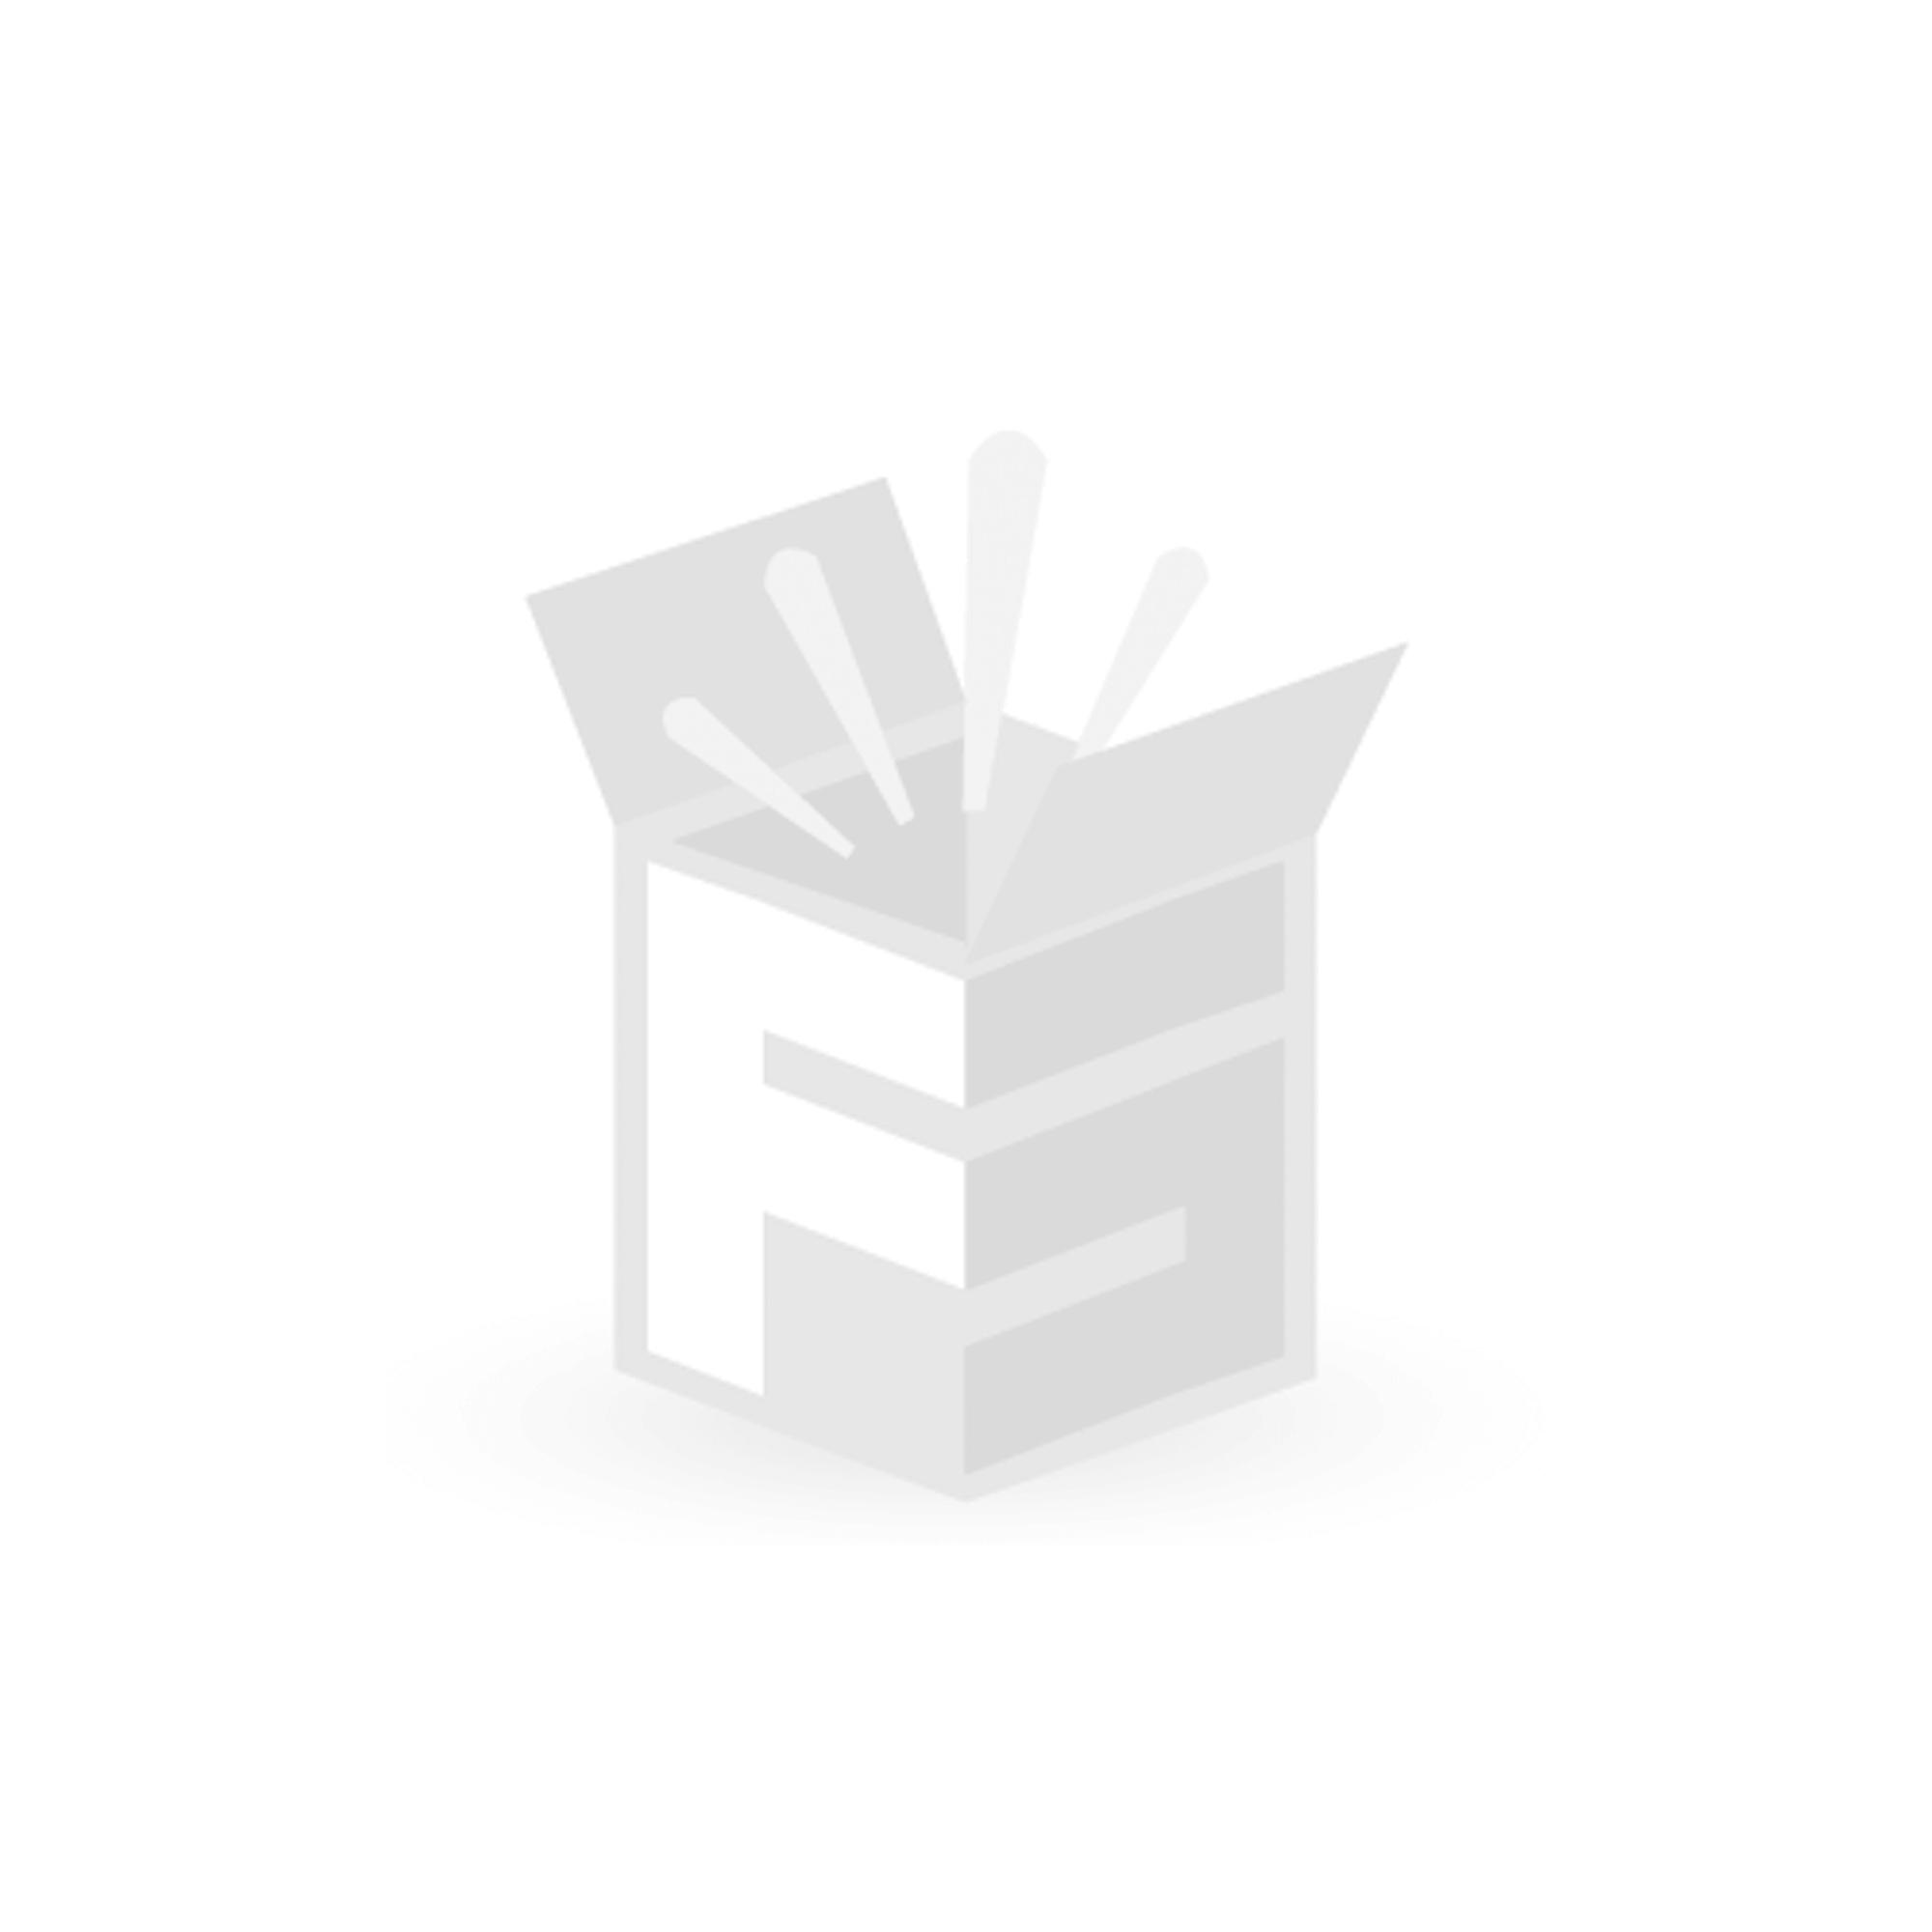 Kinzo Steckschlüssel Set 46tlg